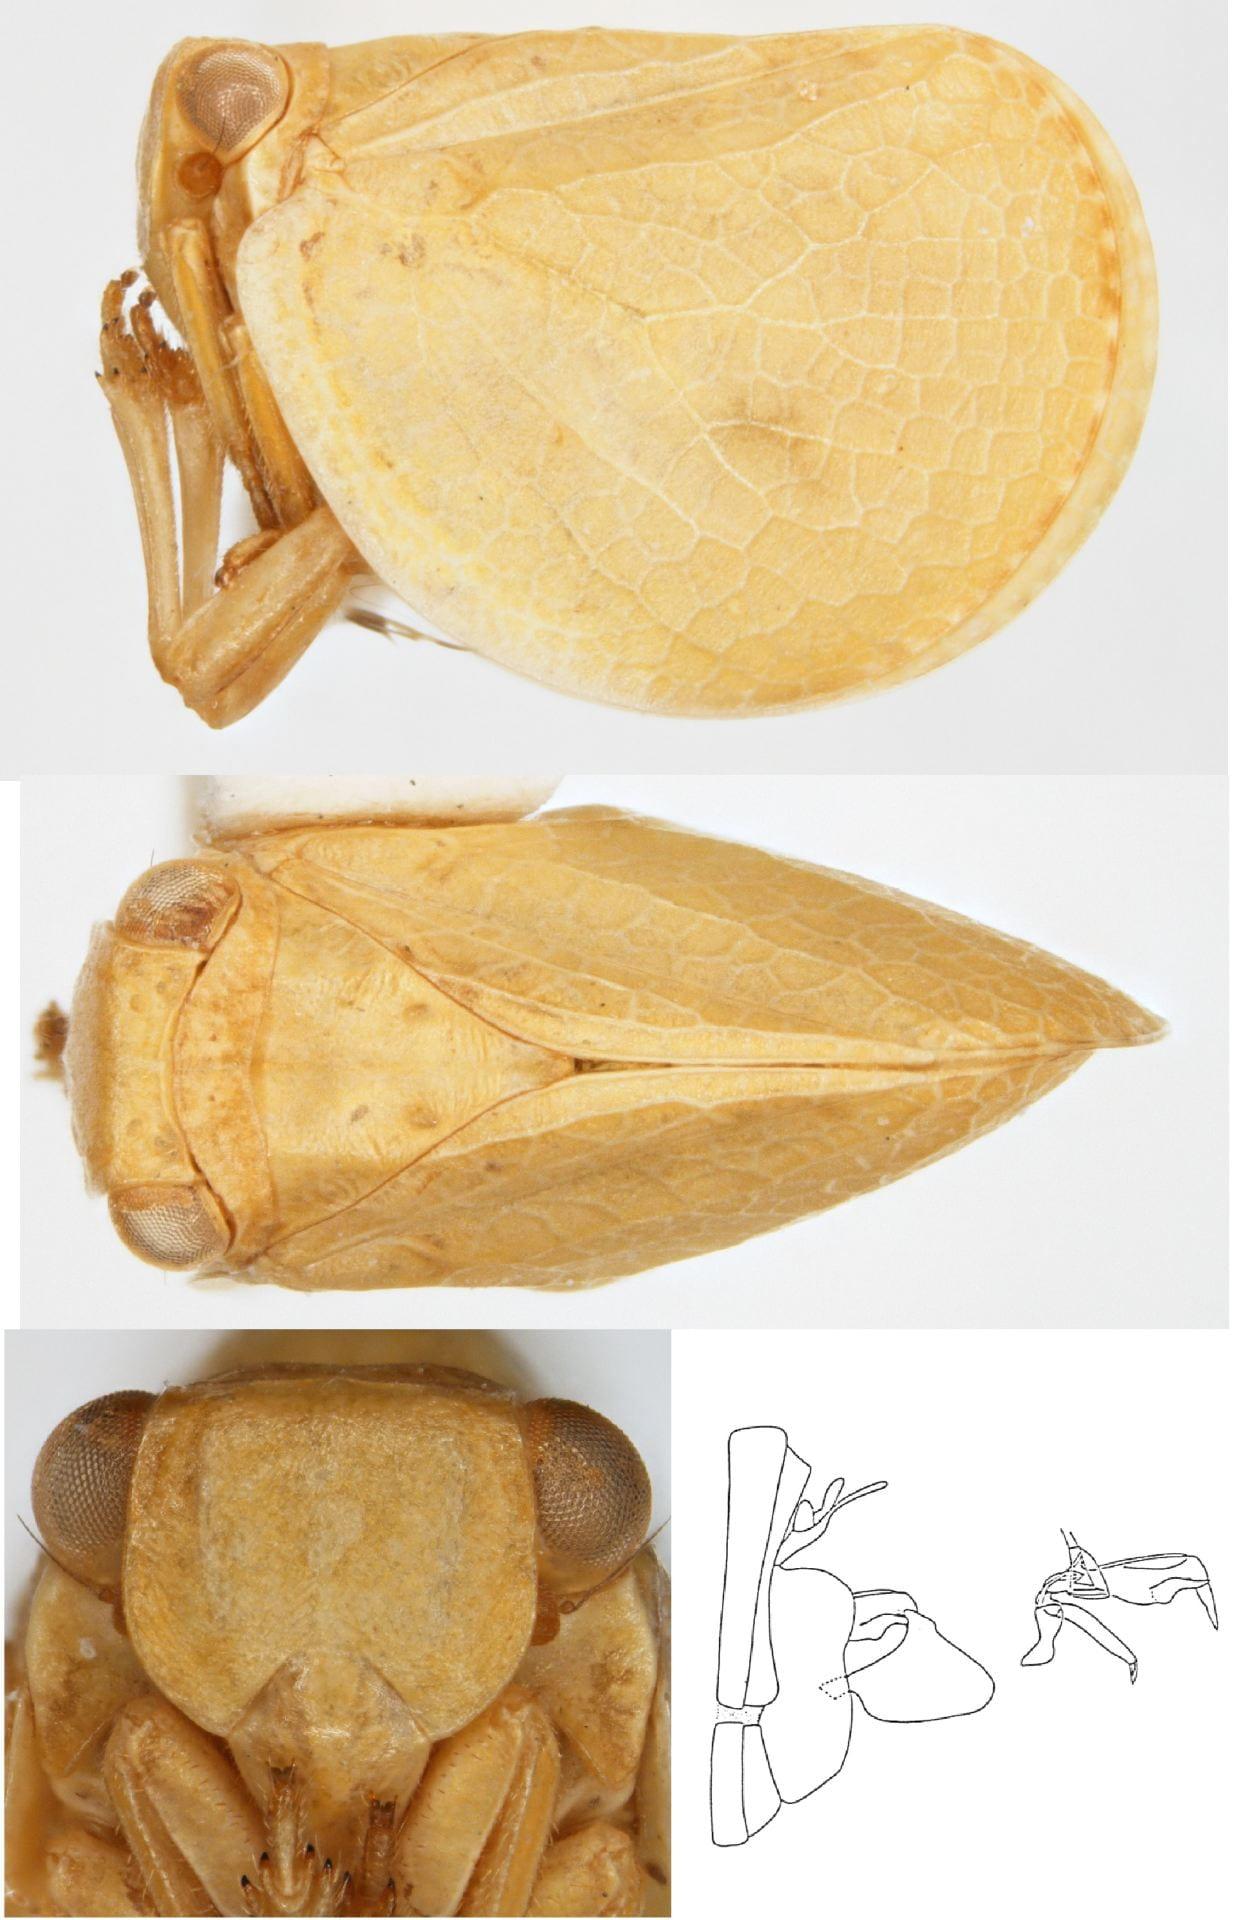 Acanalonia laticosta